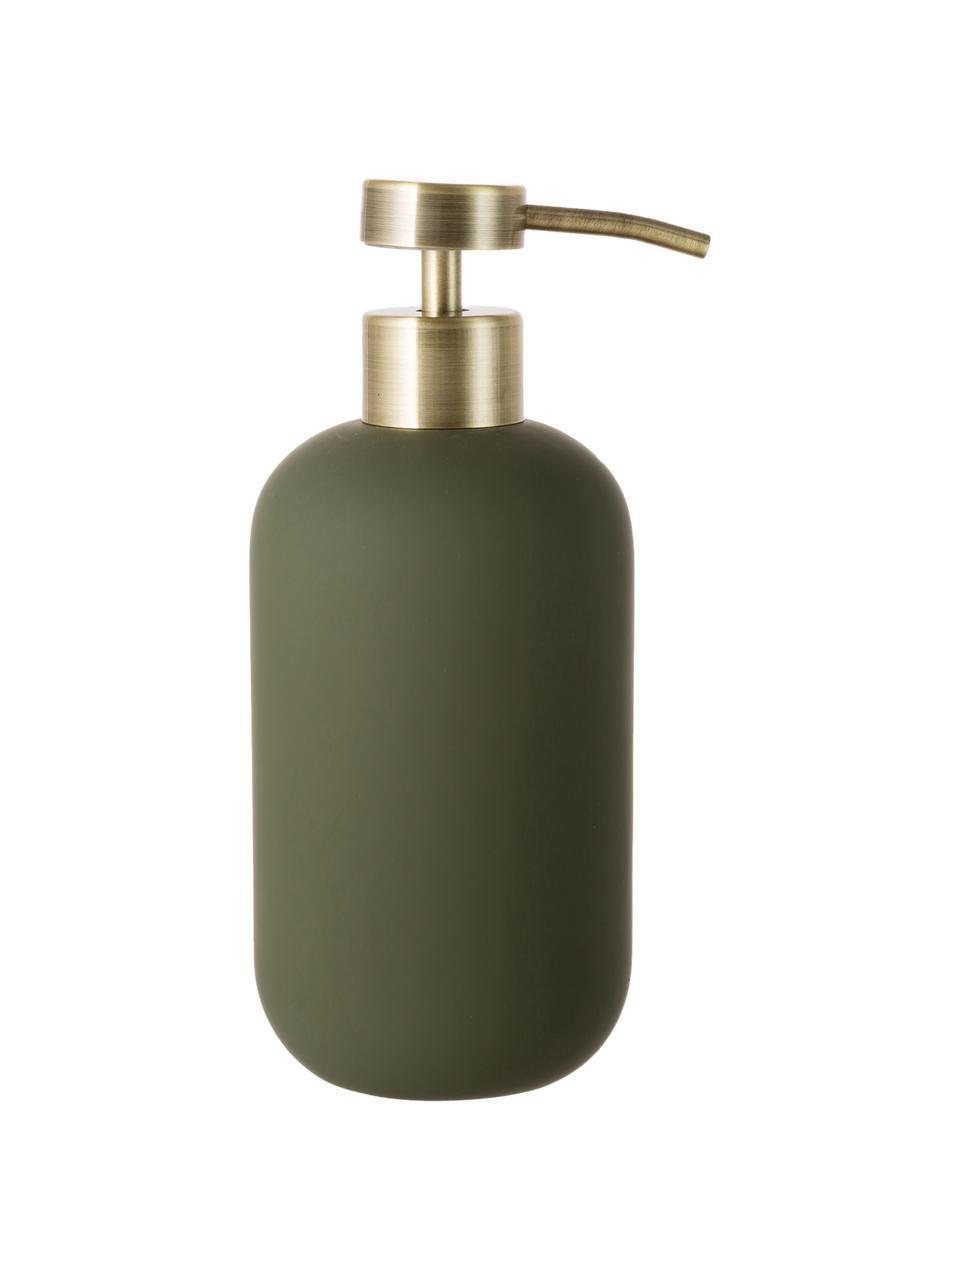 Keramik-Seifenspender Lotus, Behälter: Keramik, Pumpkopf: Metall, Olivengrün, Messingfarben, Ø 8 x H 18 cm